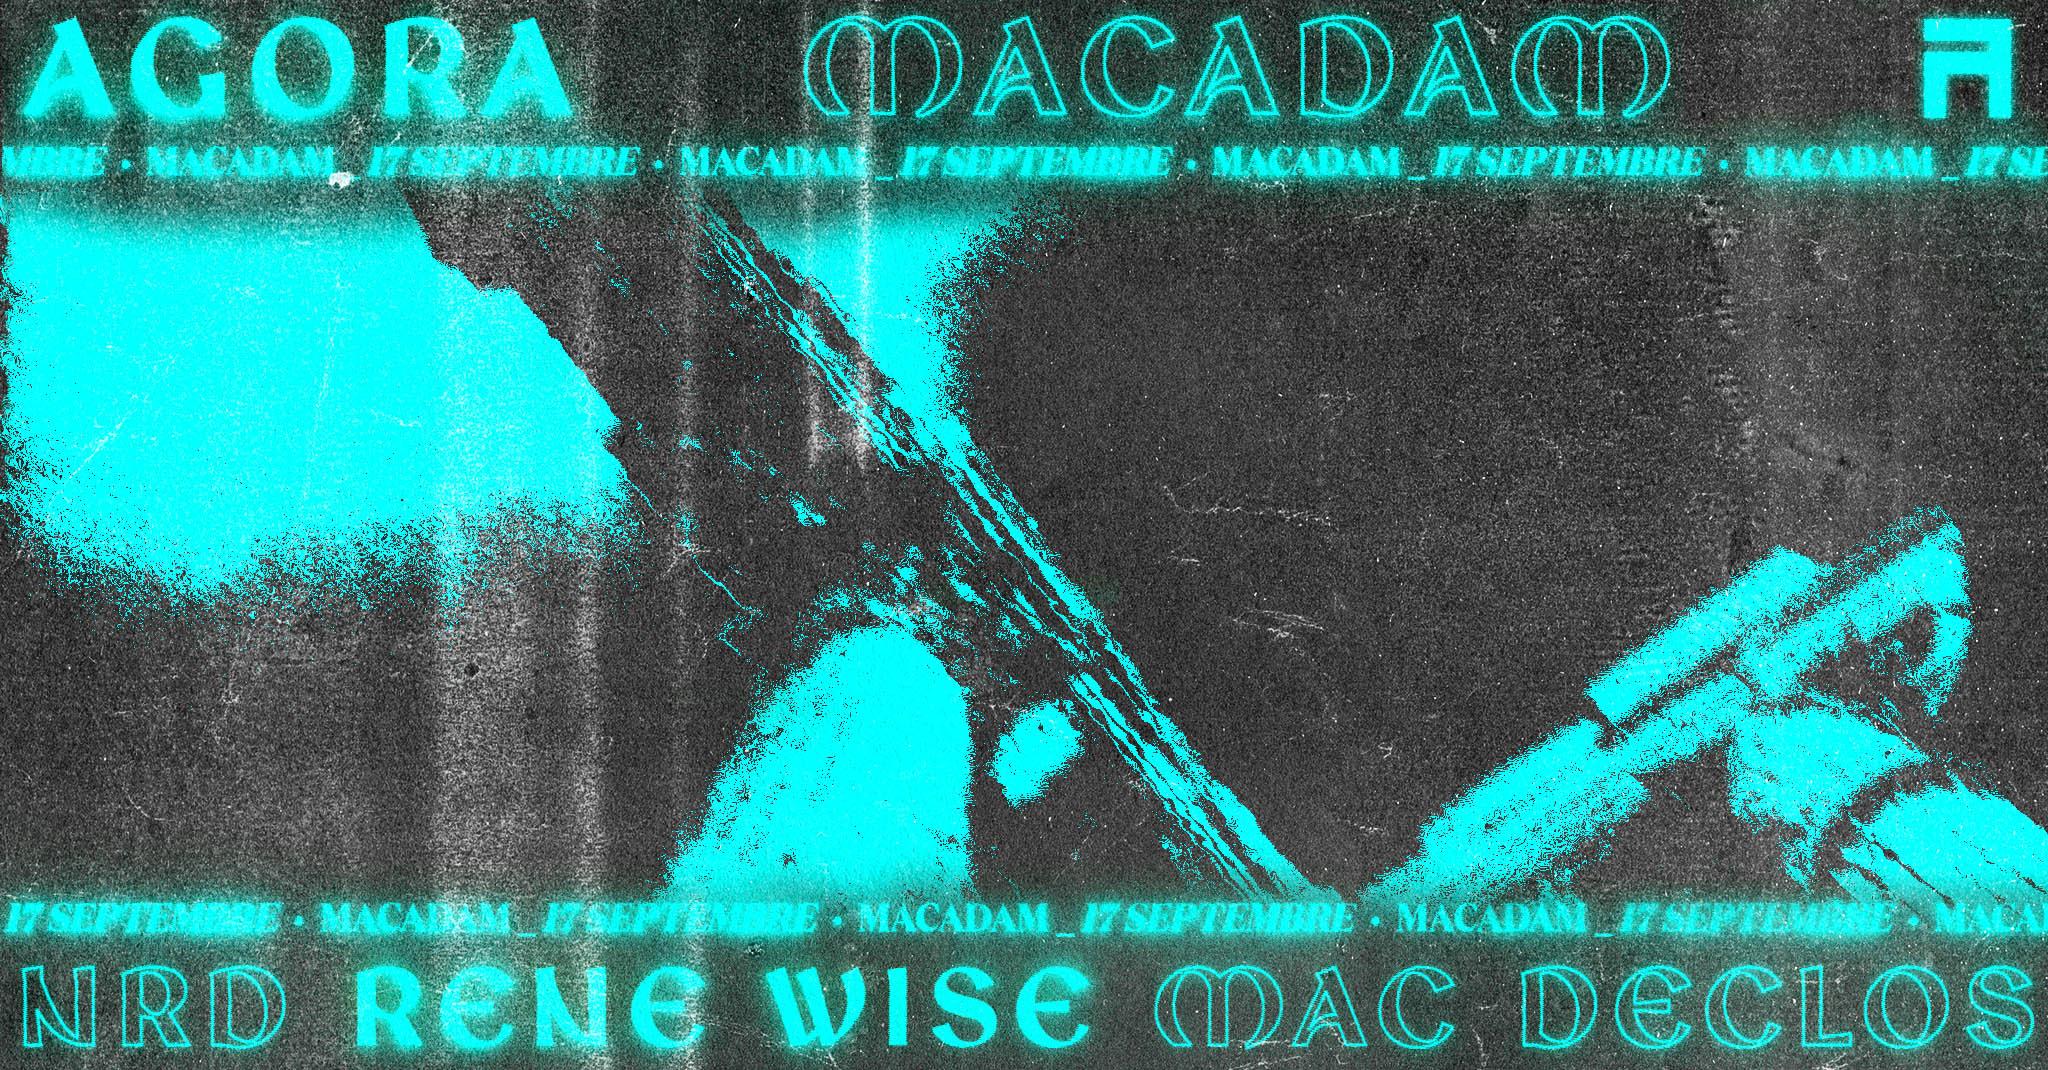 Agora Macadam w/ Rene Wise, Mac Declos, NRD